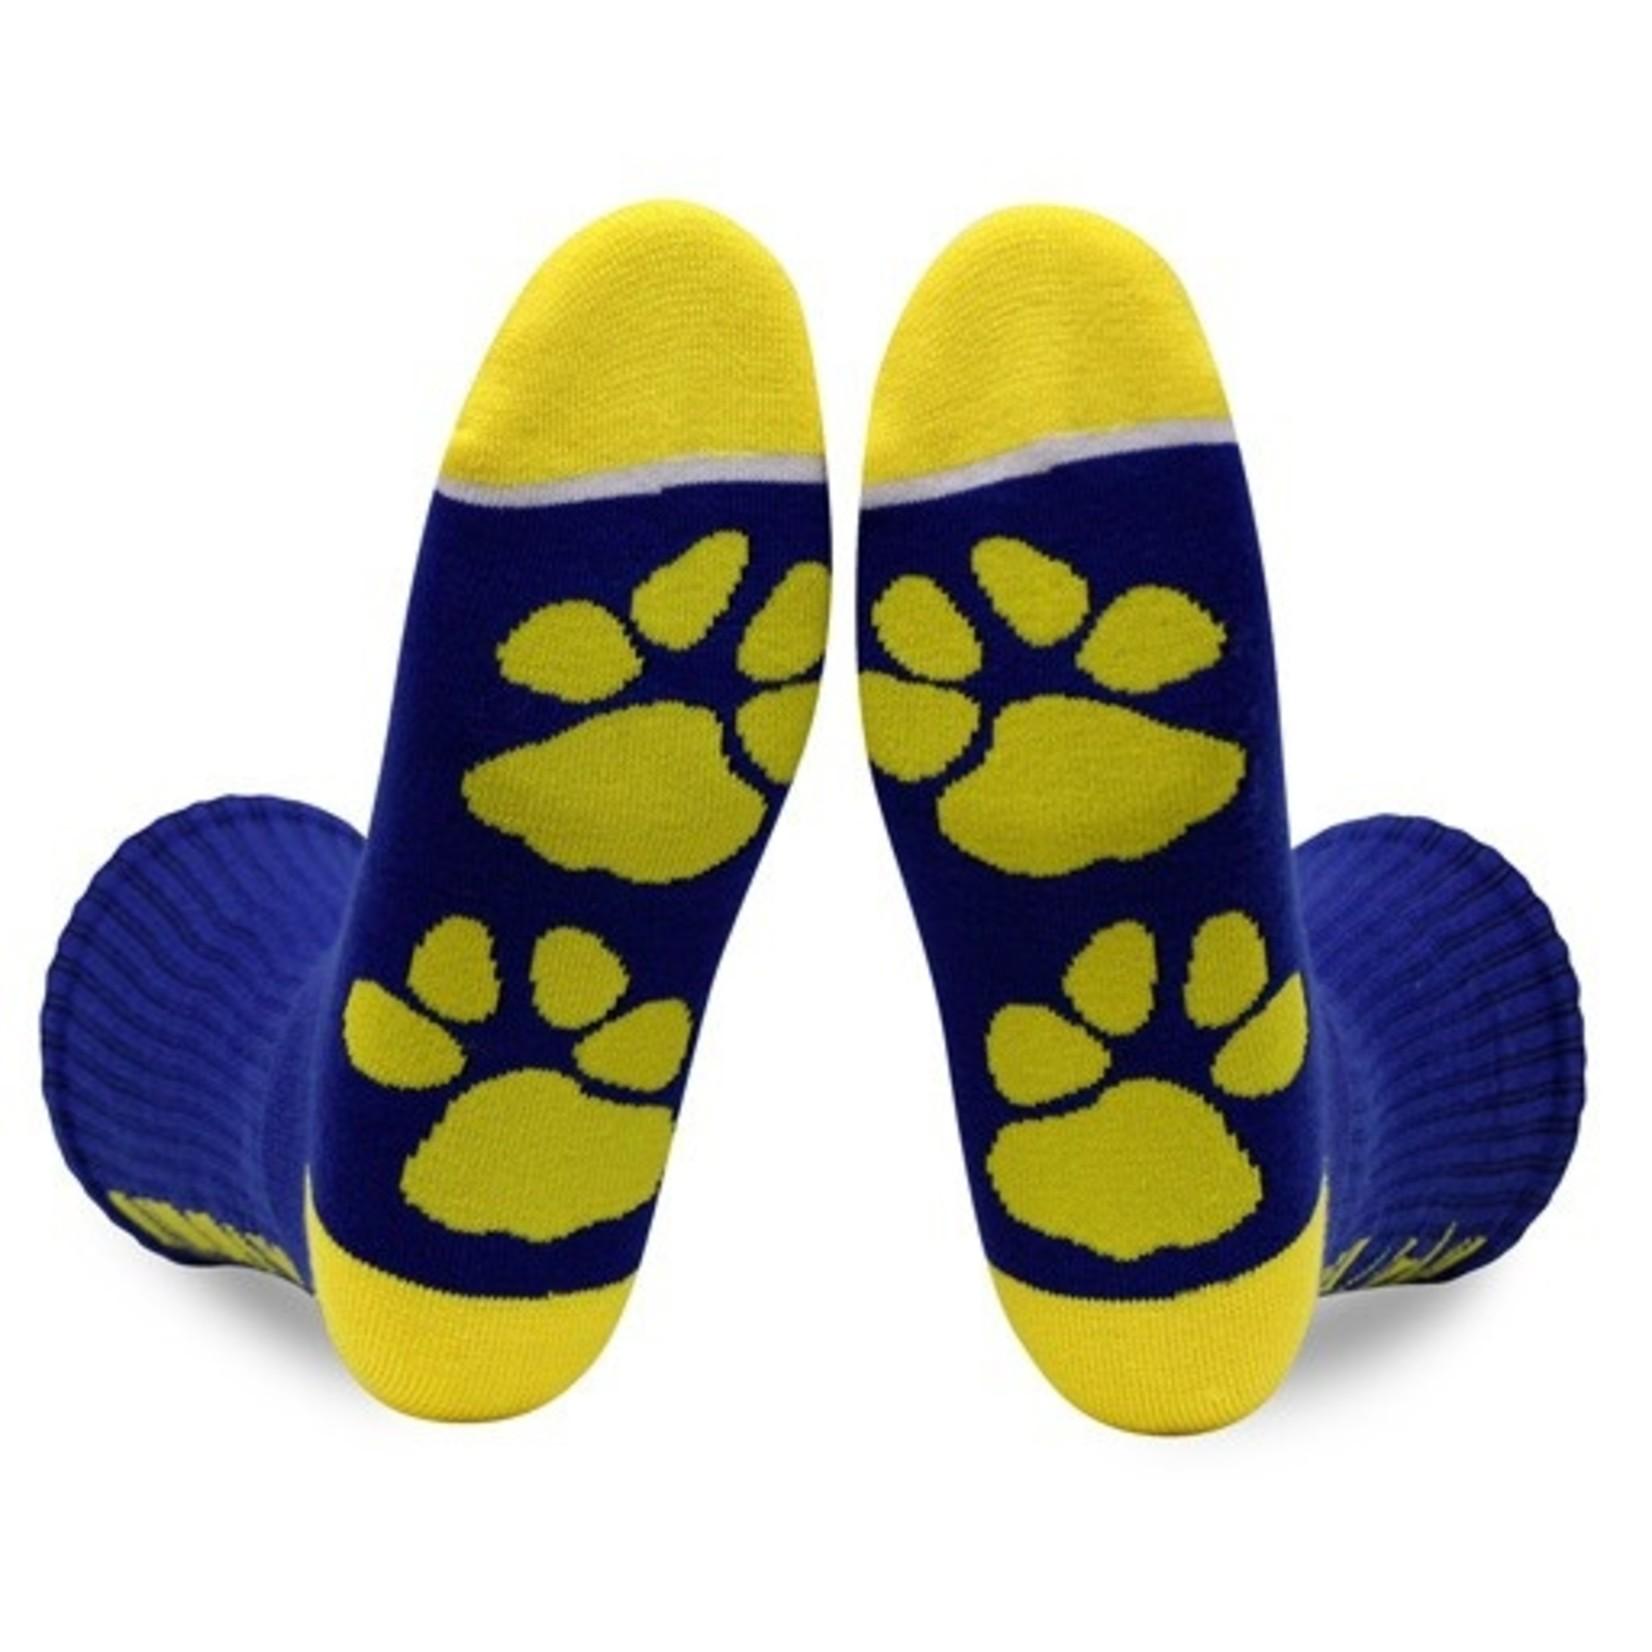 Socks-Salty Dog/Zip, RO/YE